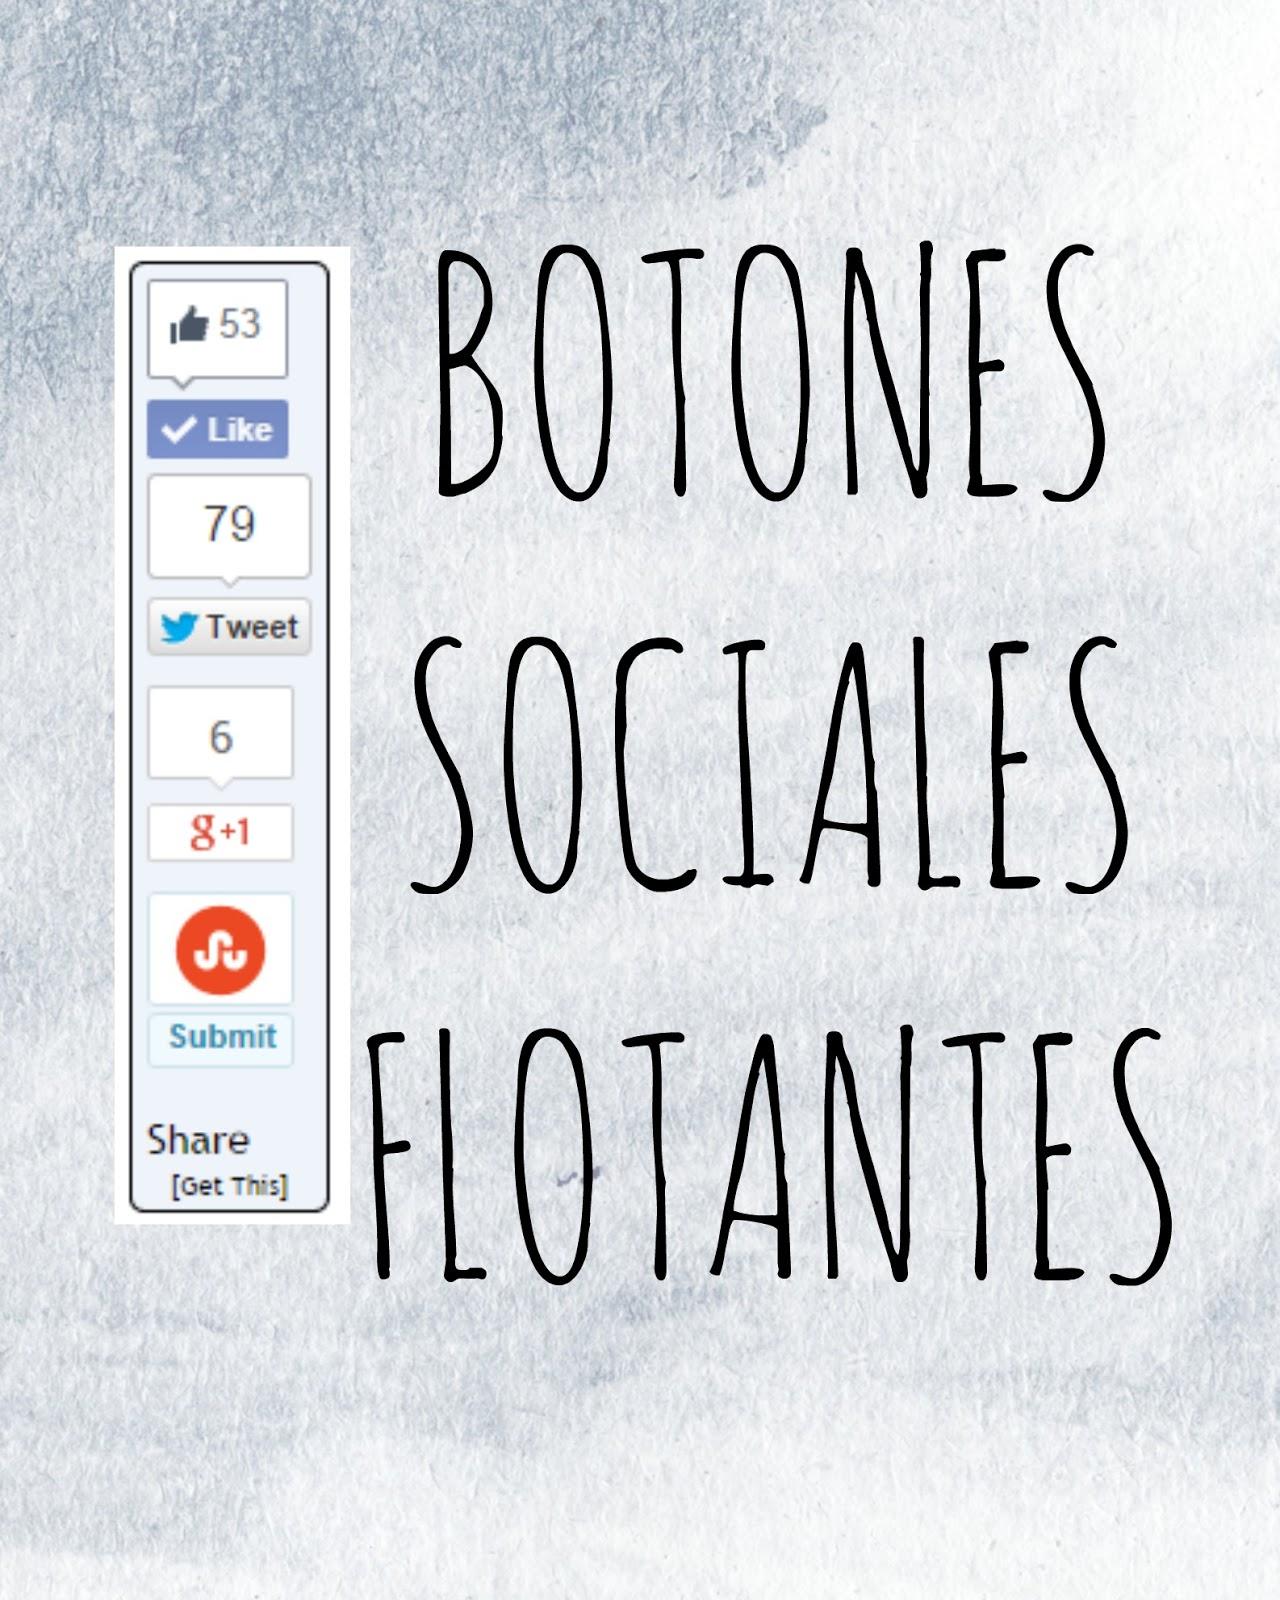 BOTONES REDES SOCIALES FLOTANTES  PARA BLOGGER